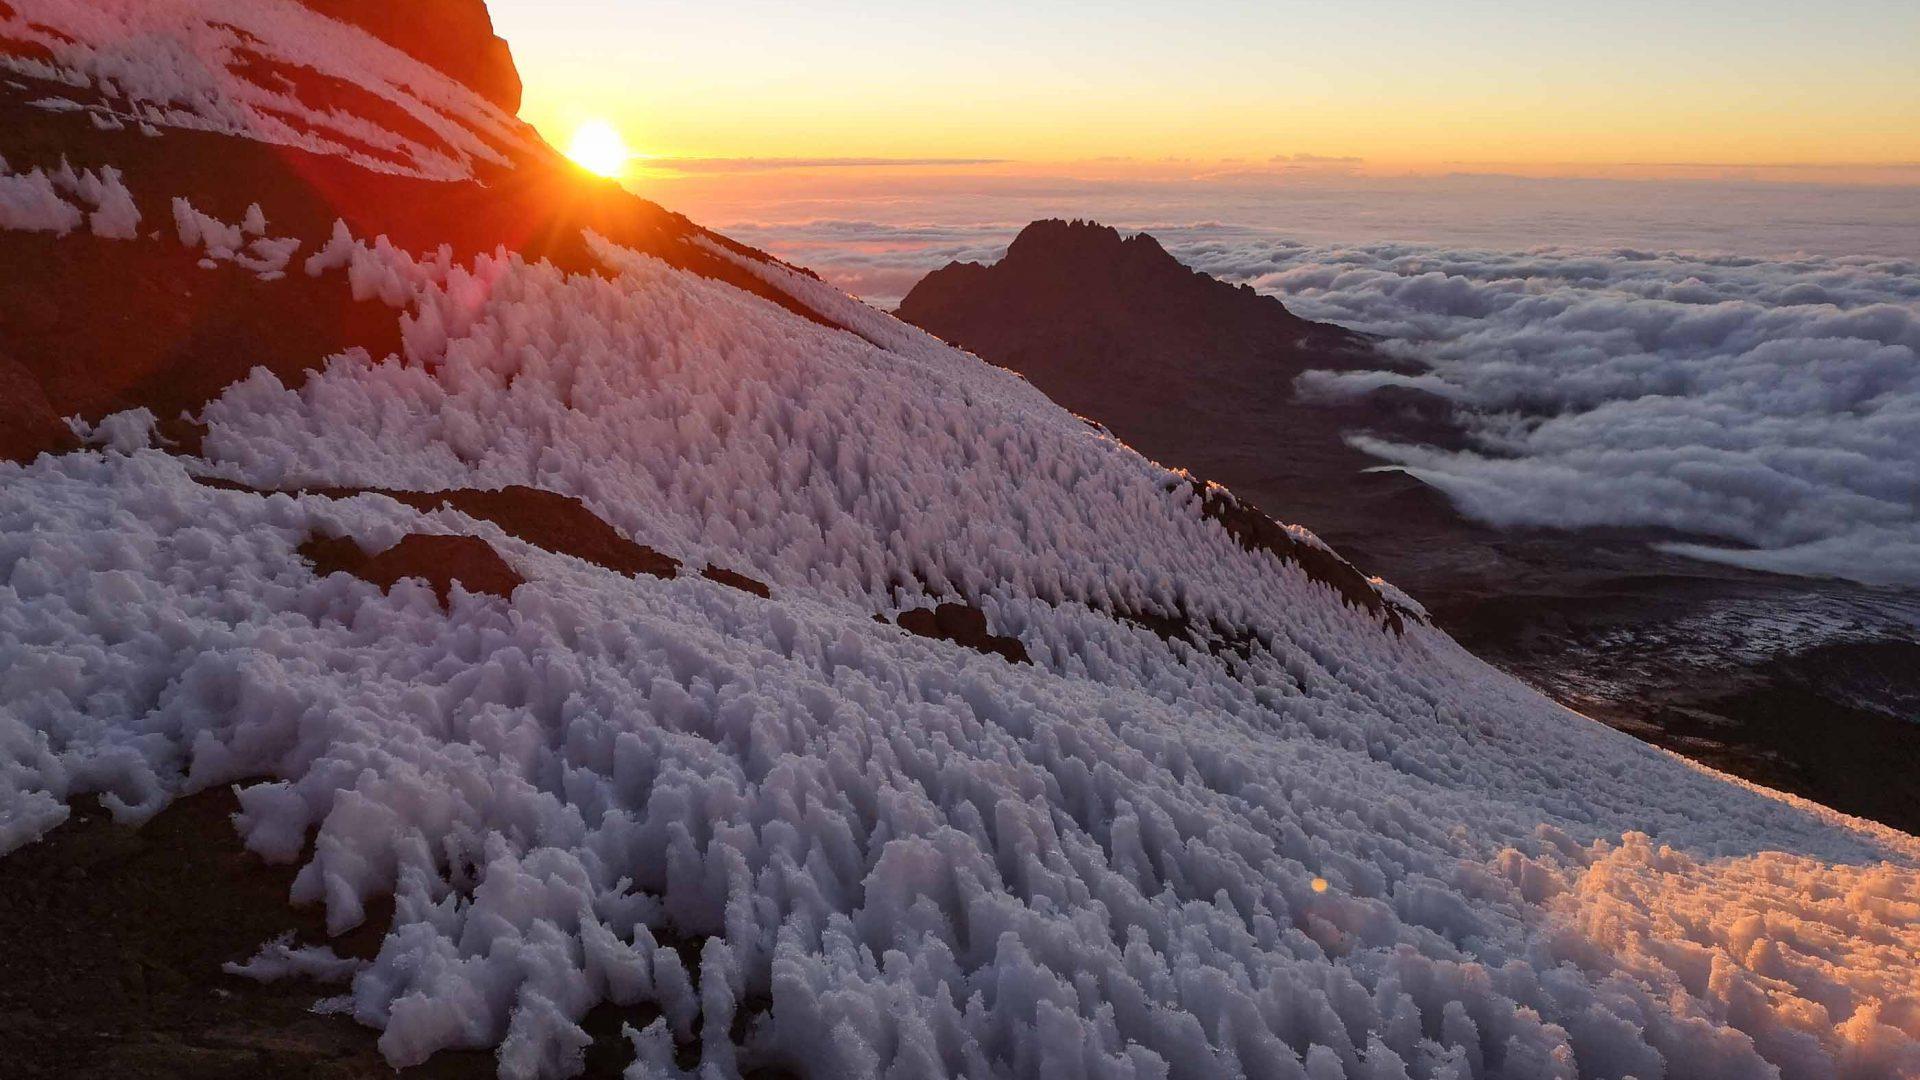 Sunrise at the top of Mount Kilimanjaro.